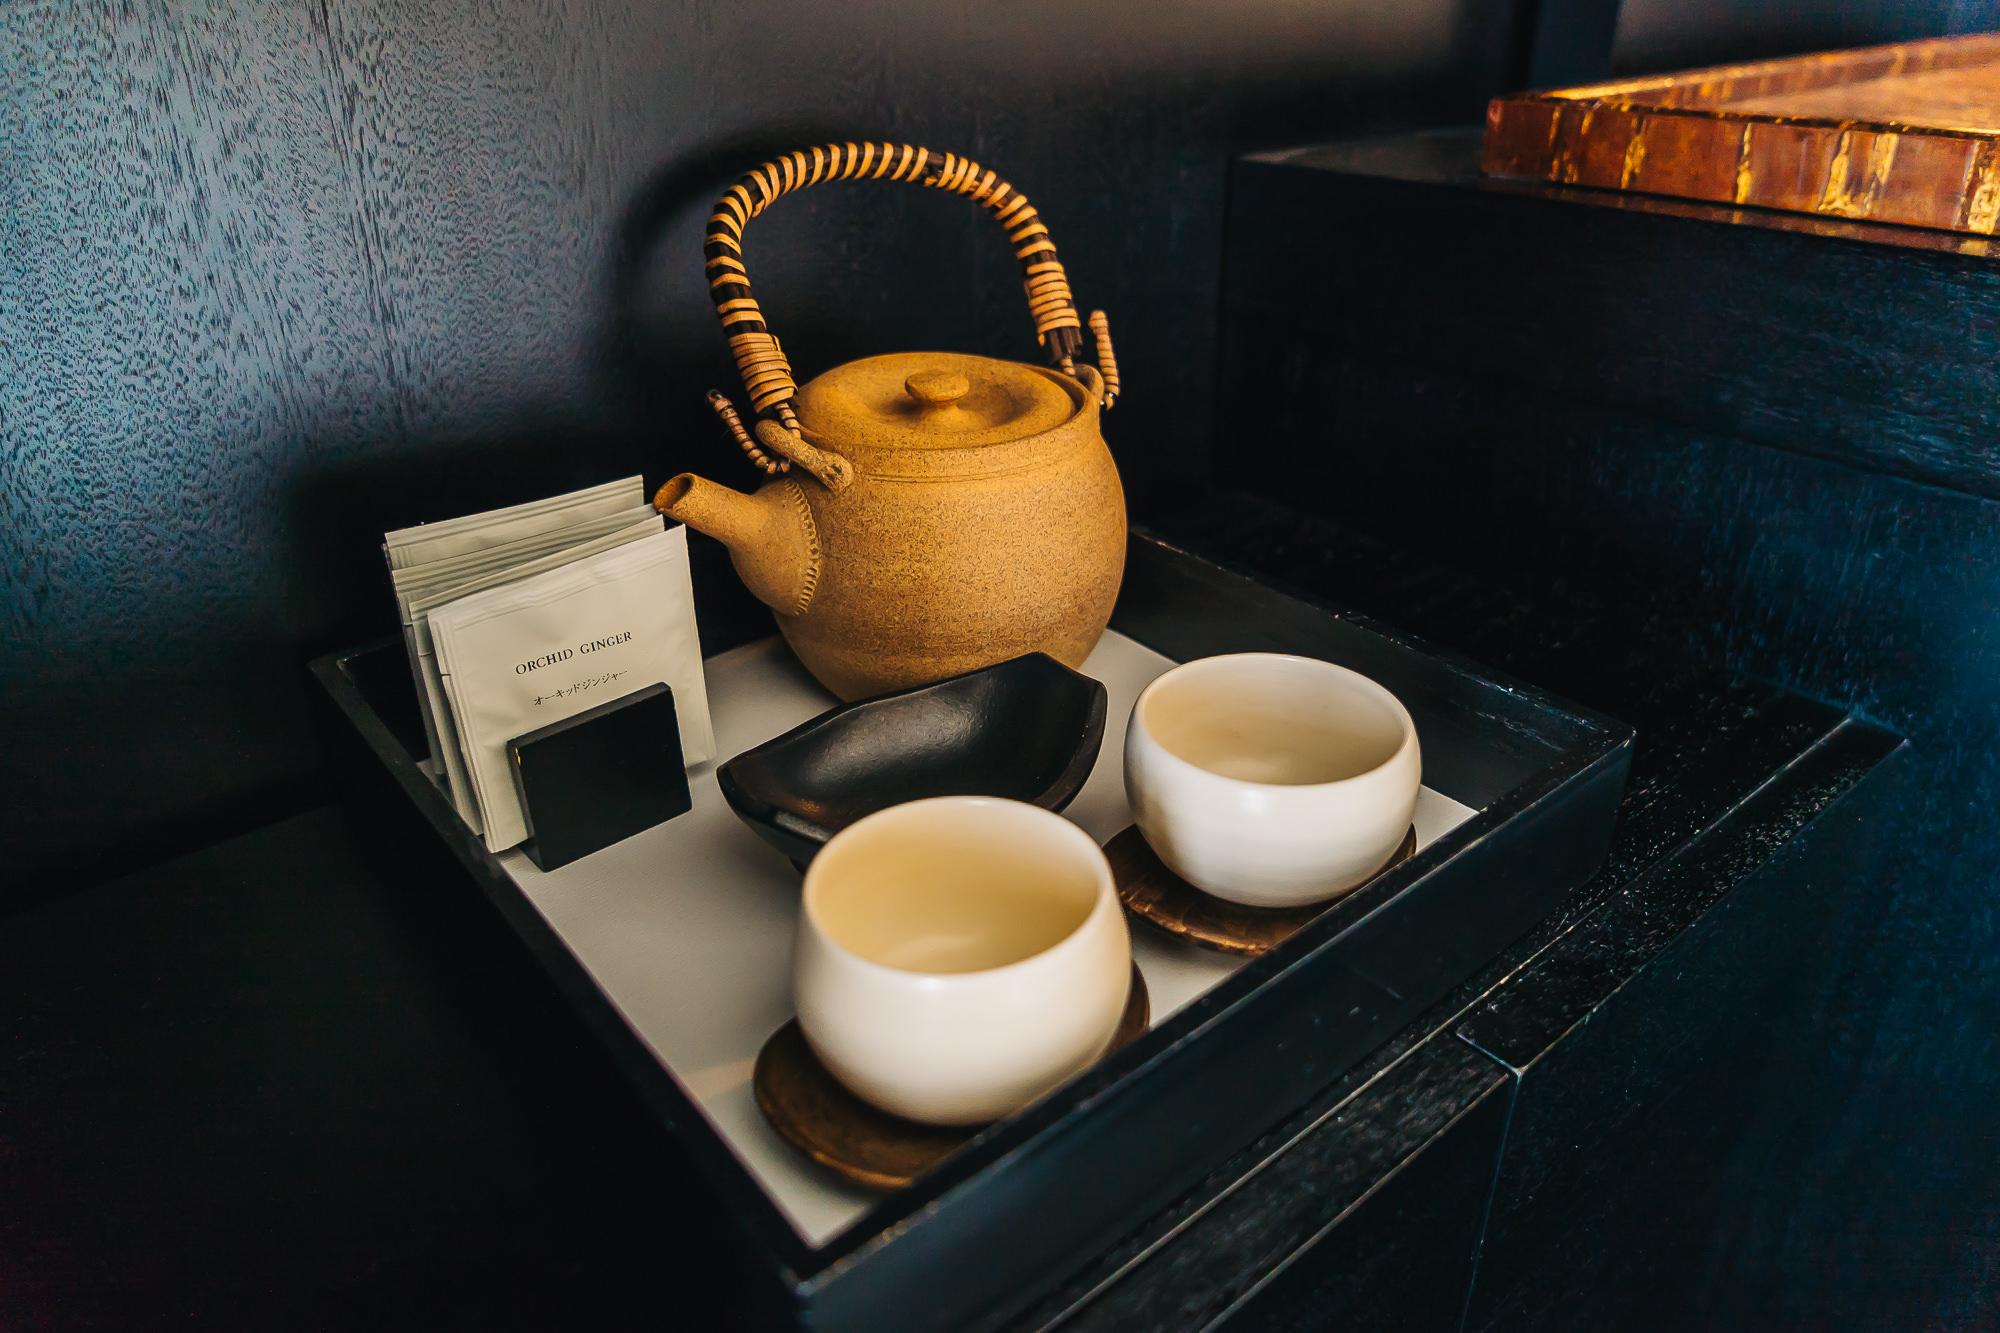 WE LOVE HAVING GREEN TEA IN THE MORNINGS